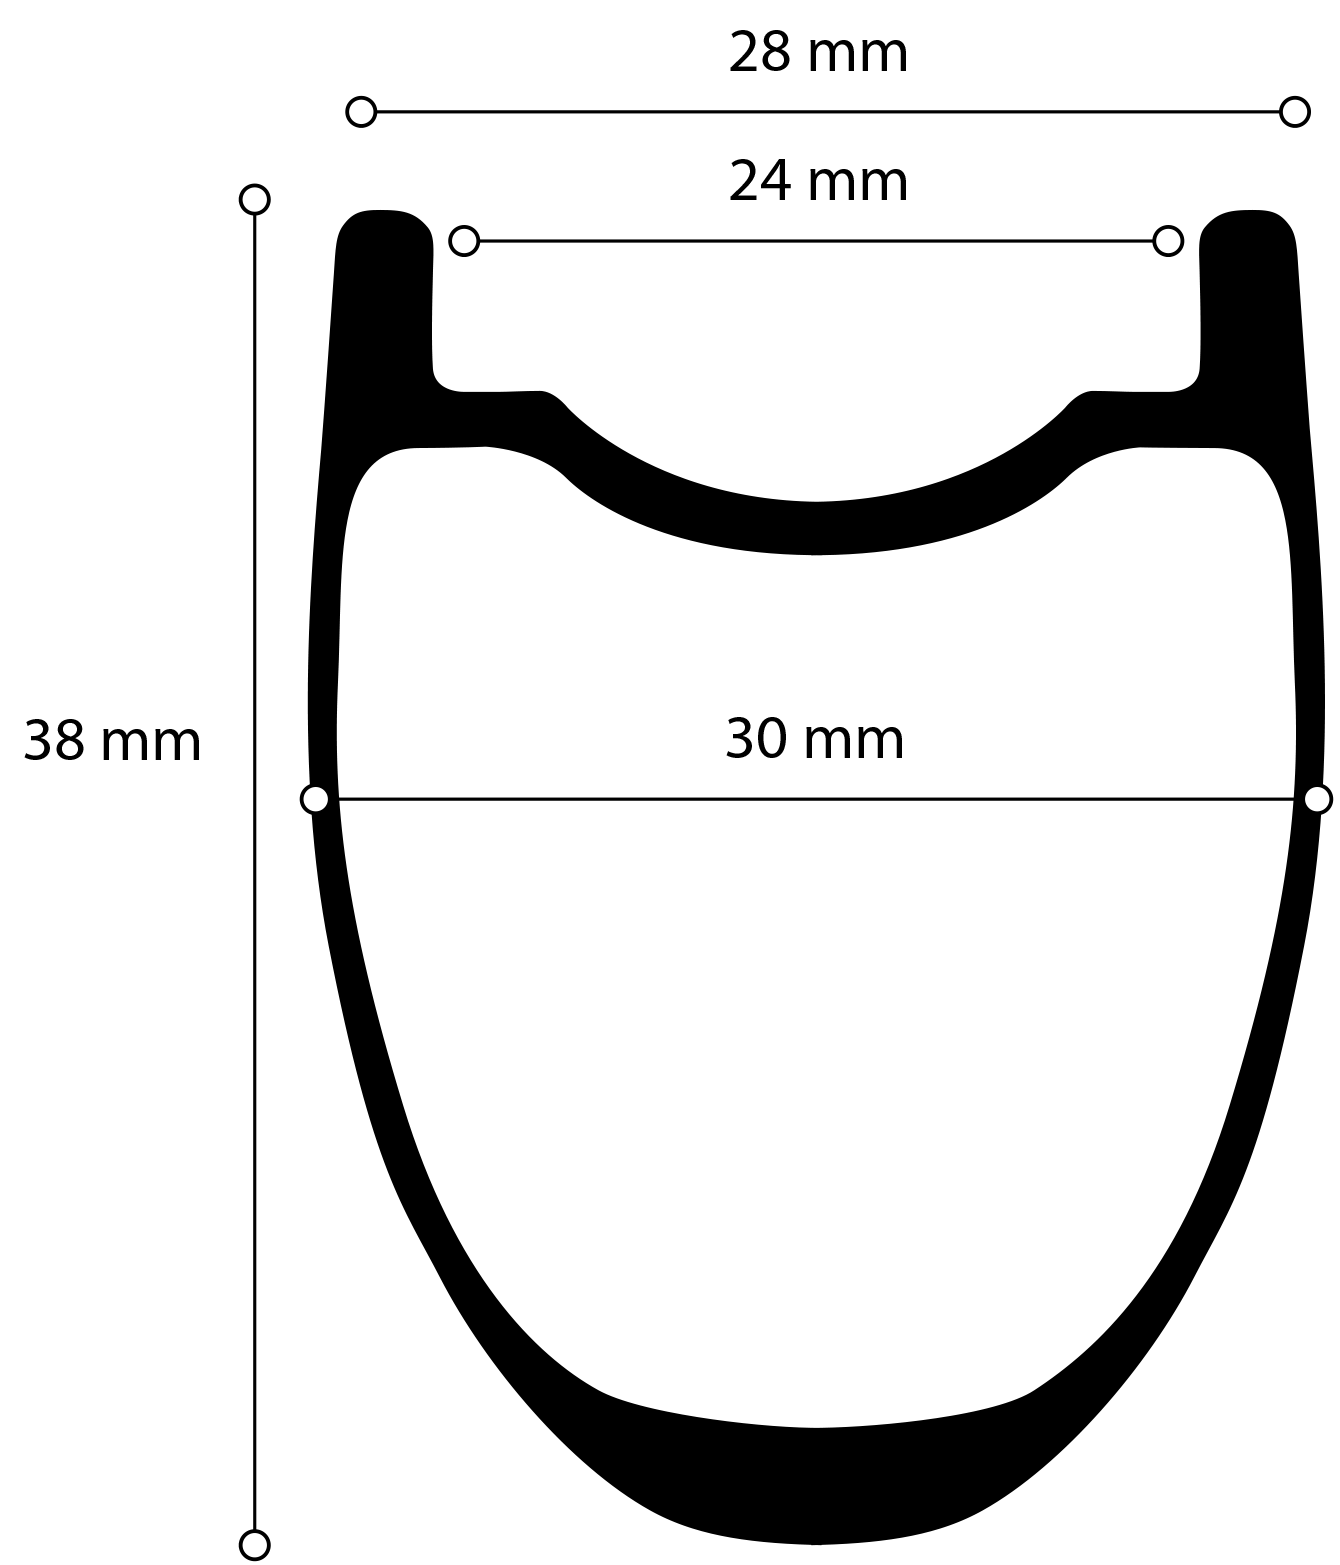 RAR EVEN GX38-700C